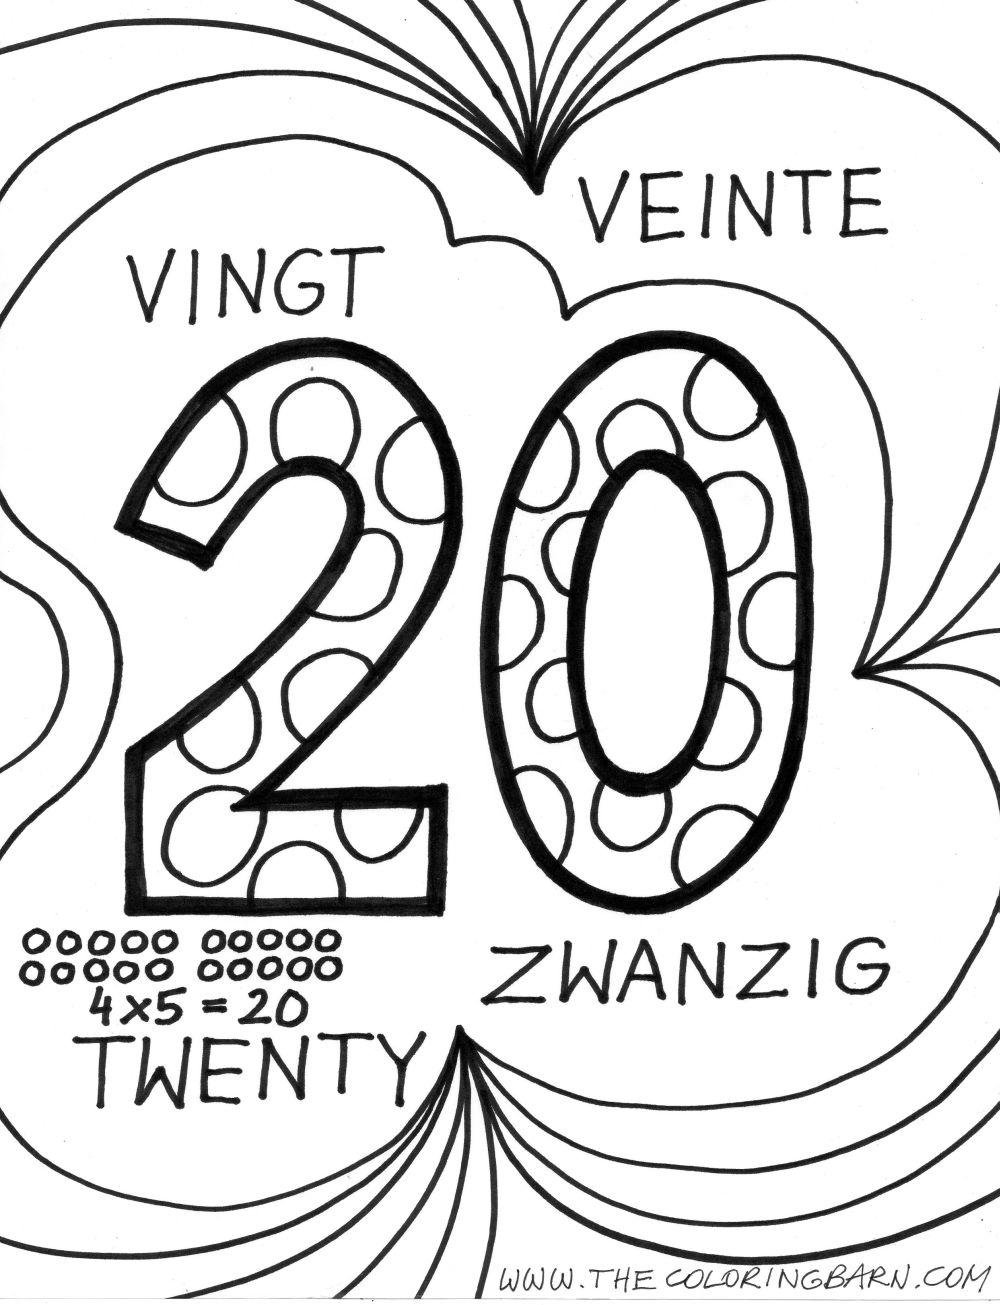 Trinity in Uganda: Vingt, Veinte, Zwanzig... Twenty!